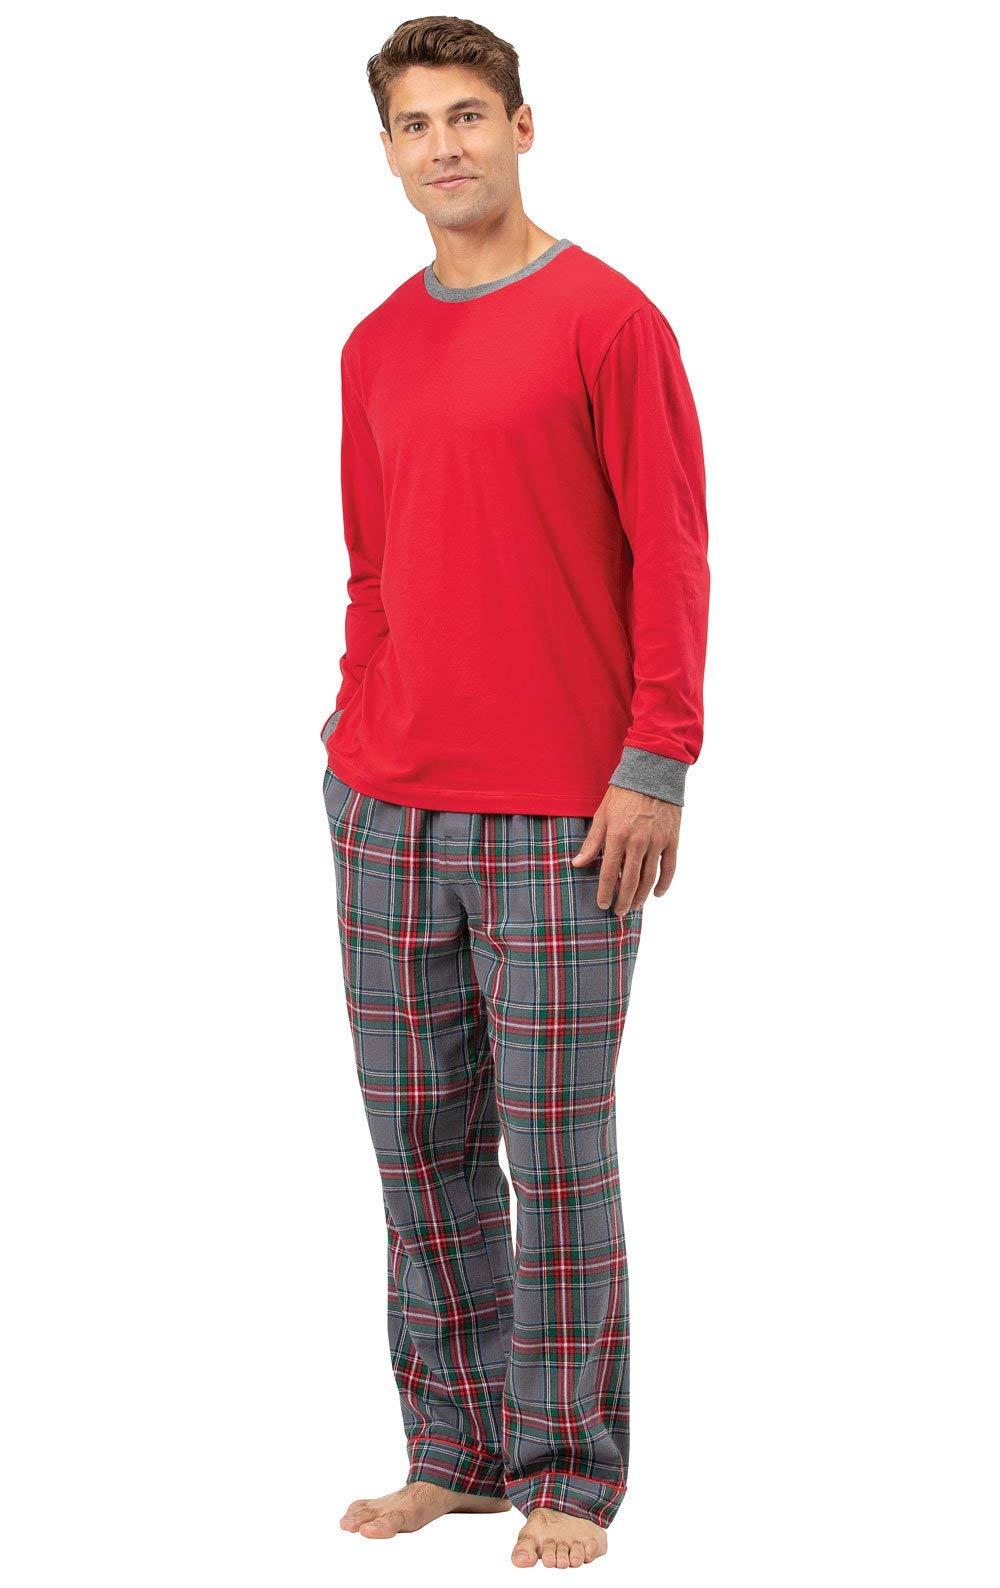 PajamaGram Mens PJs Set Plaid - Men's Flannel Pajama Set, Solid Top, Gray, LG